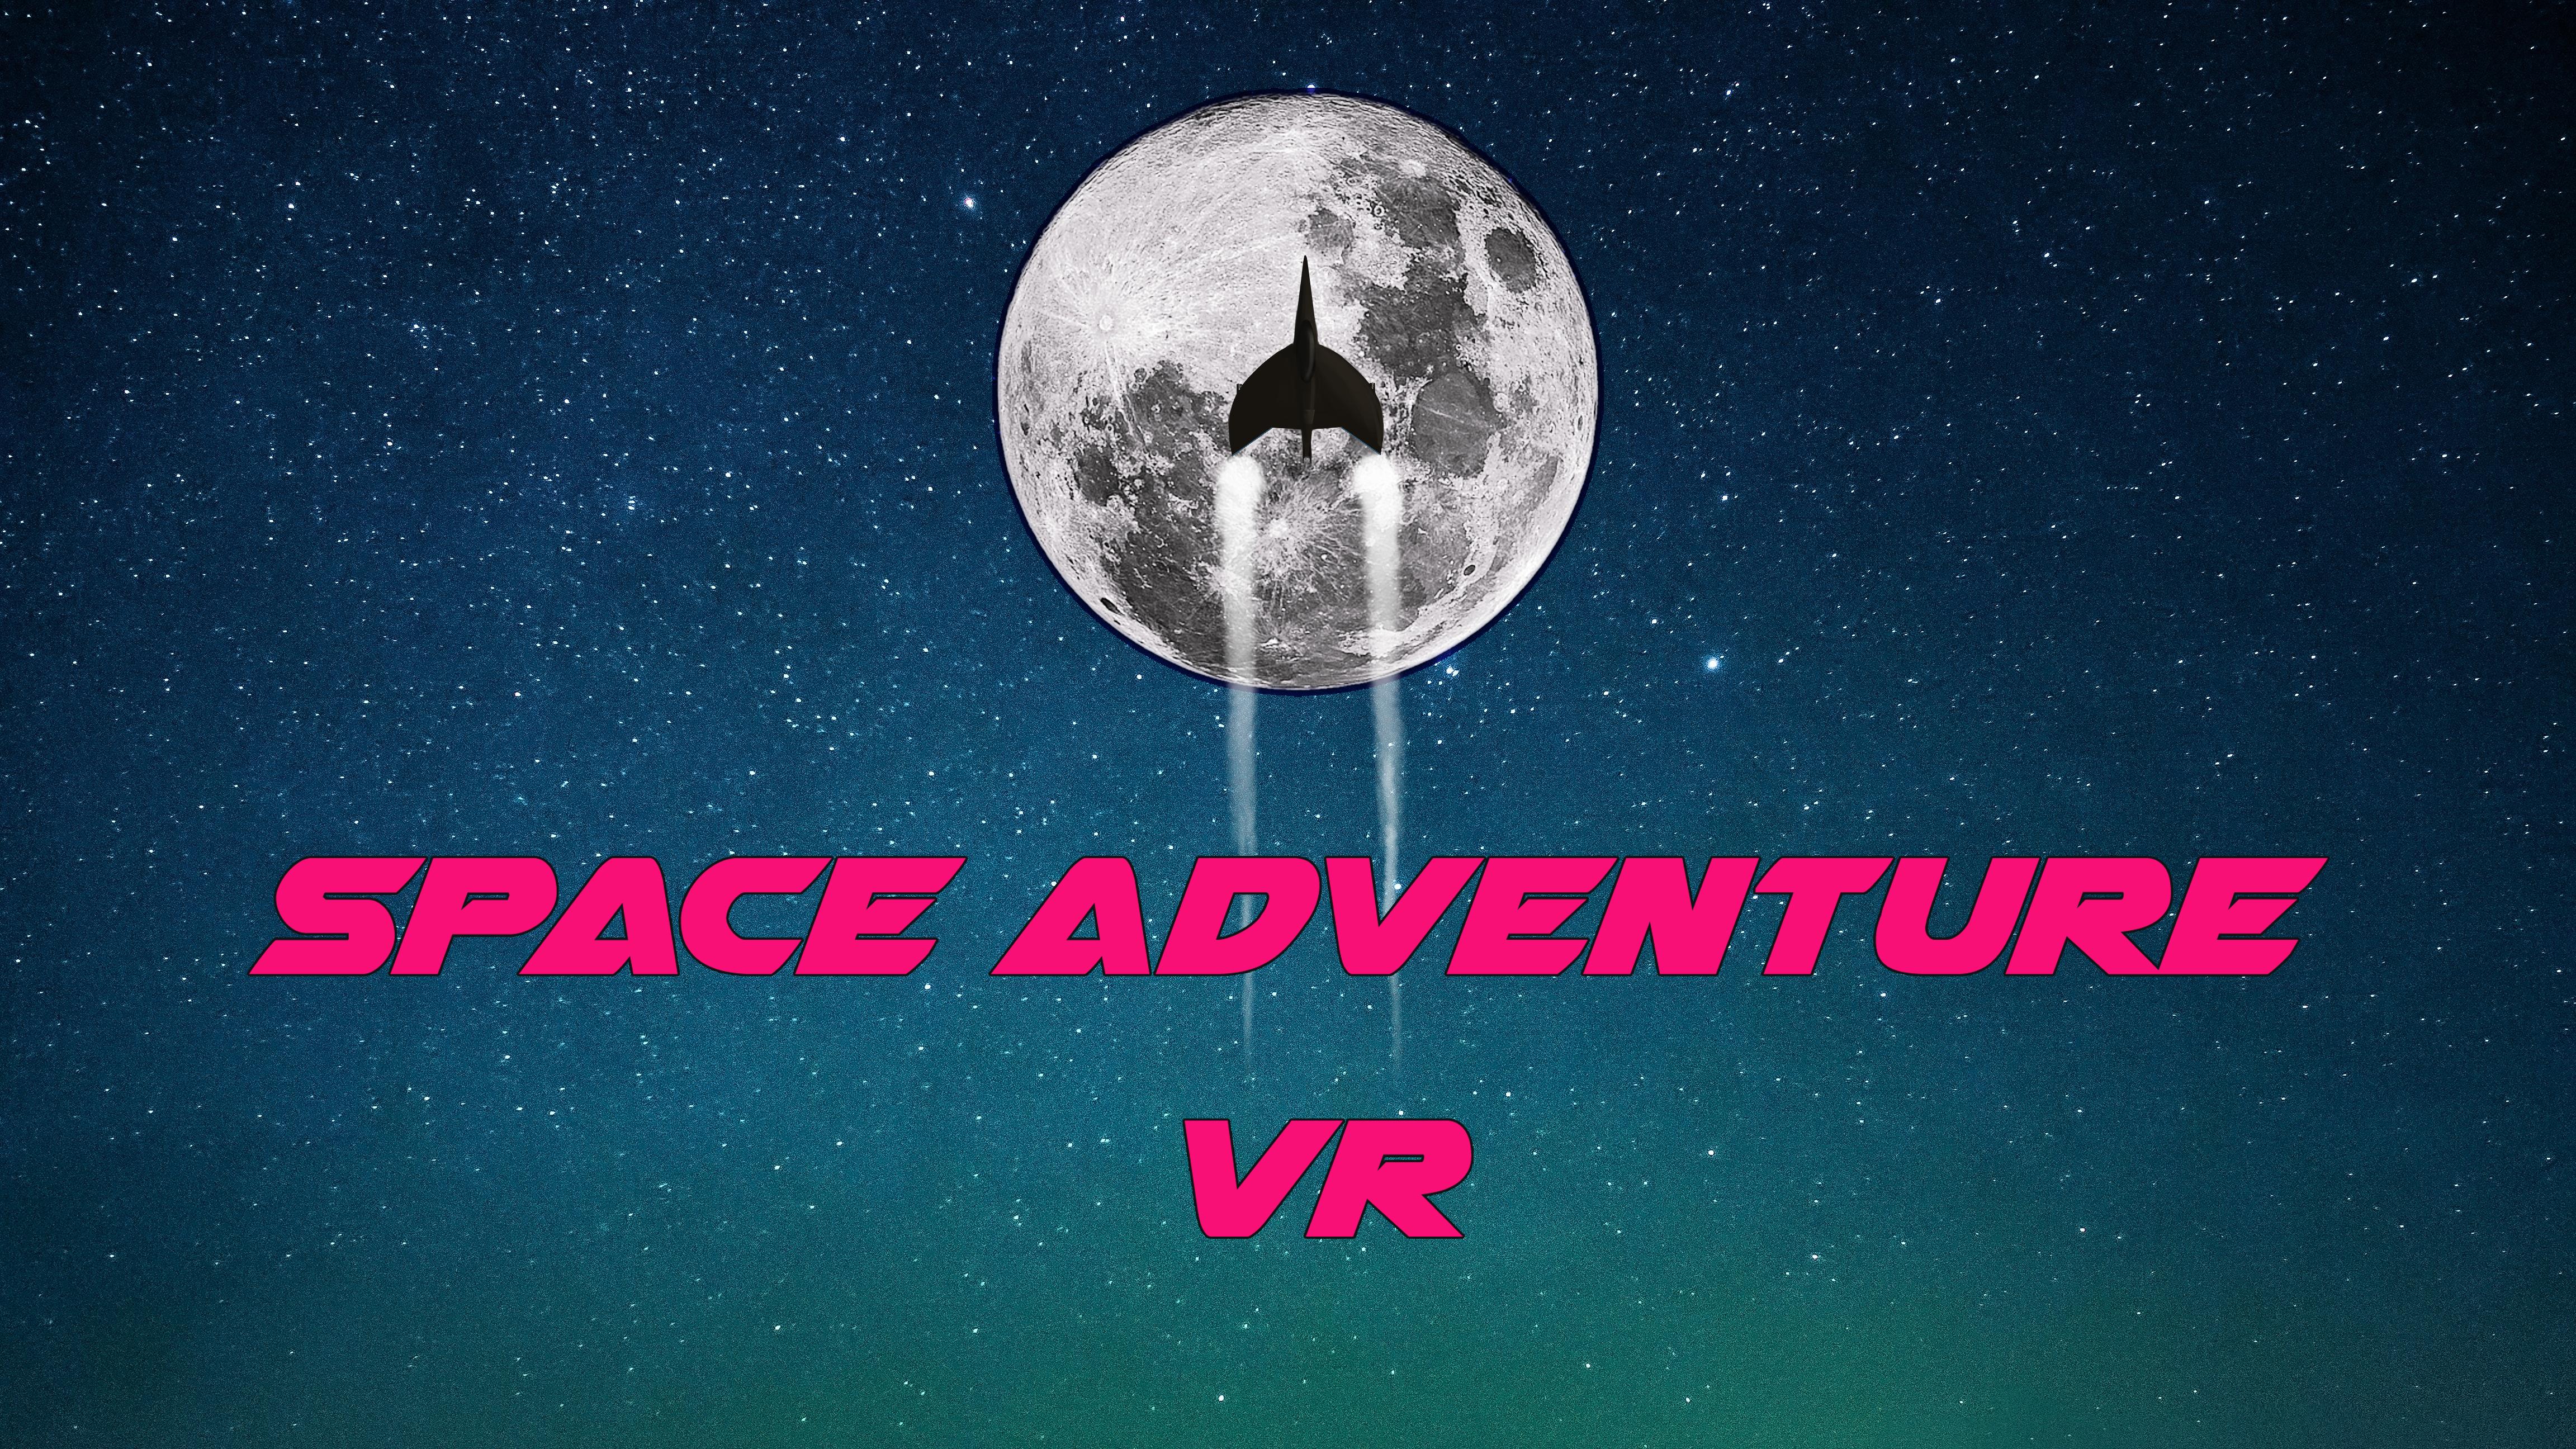 Space Adventure VR Mobile Demo